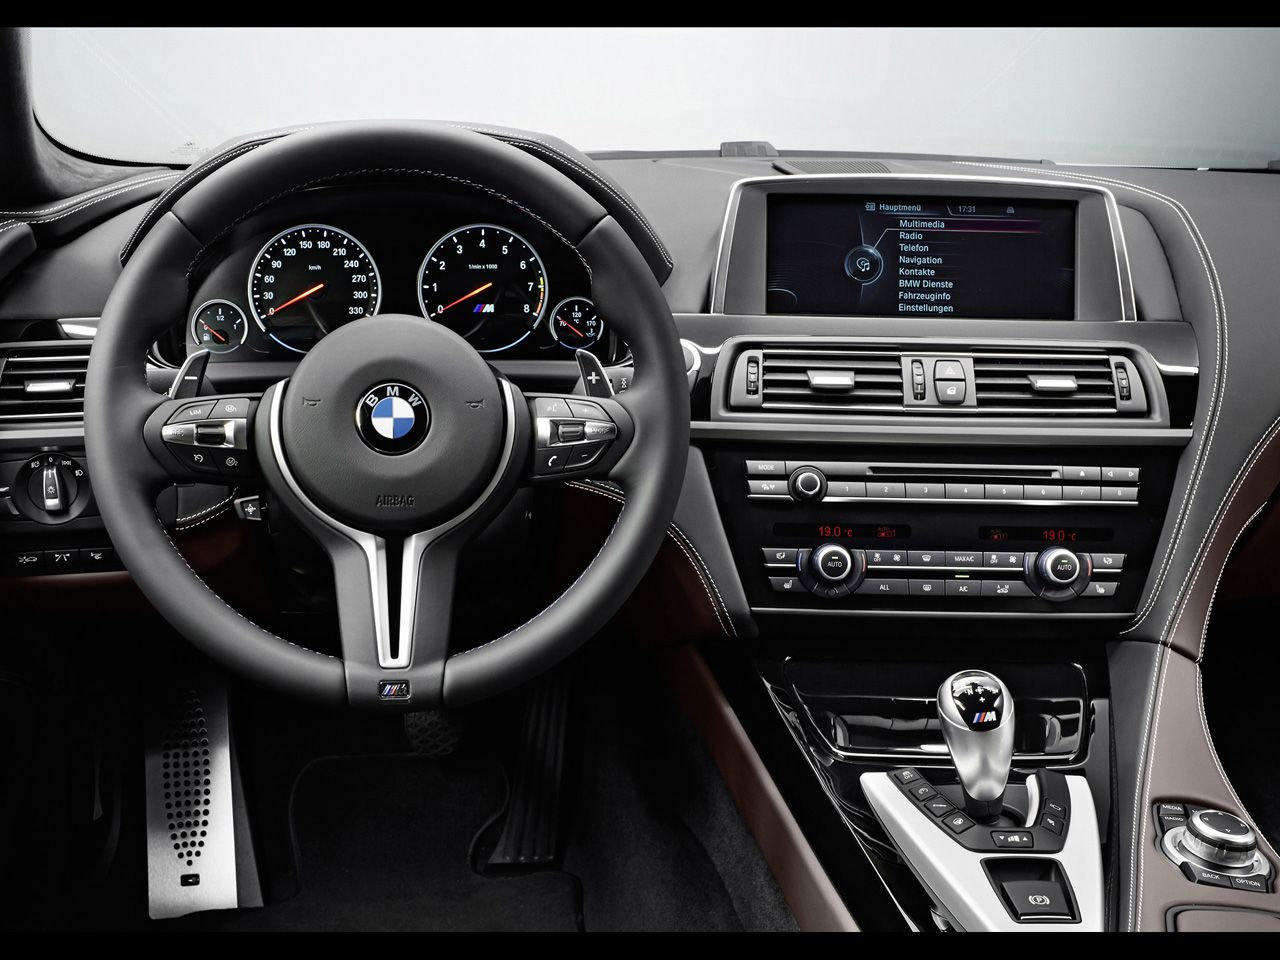 2013 Bmw M6 Gran Coupe Interior 3 1280x960 Wallpaper Bmw M6 Gran Coupe Bmw Models